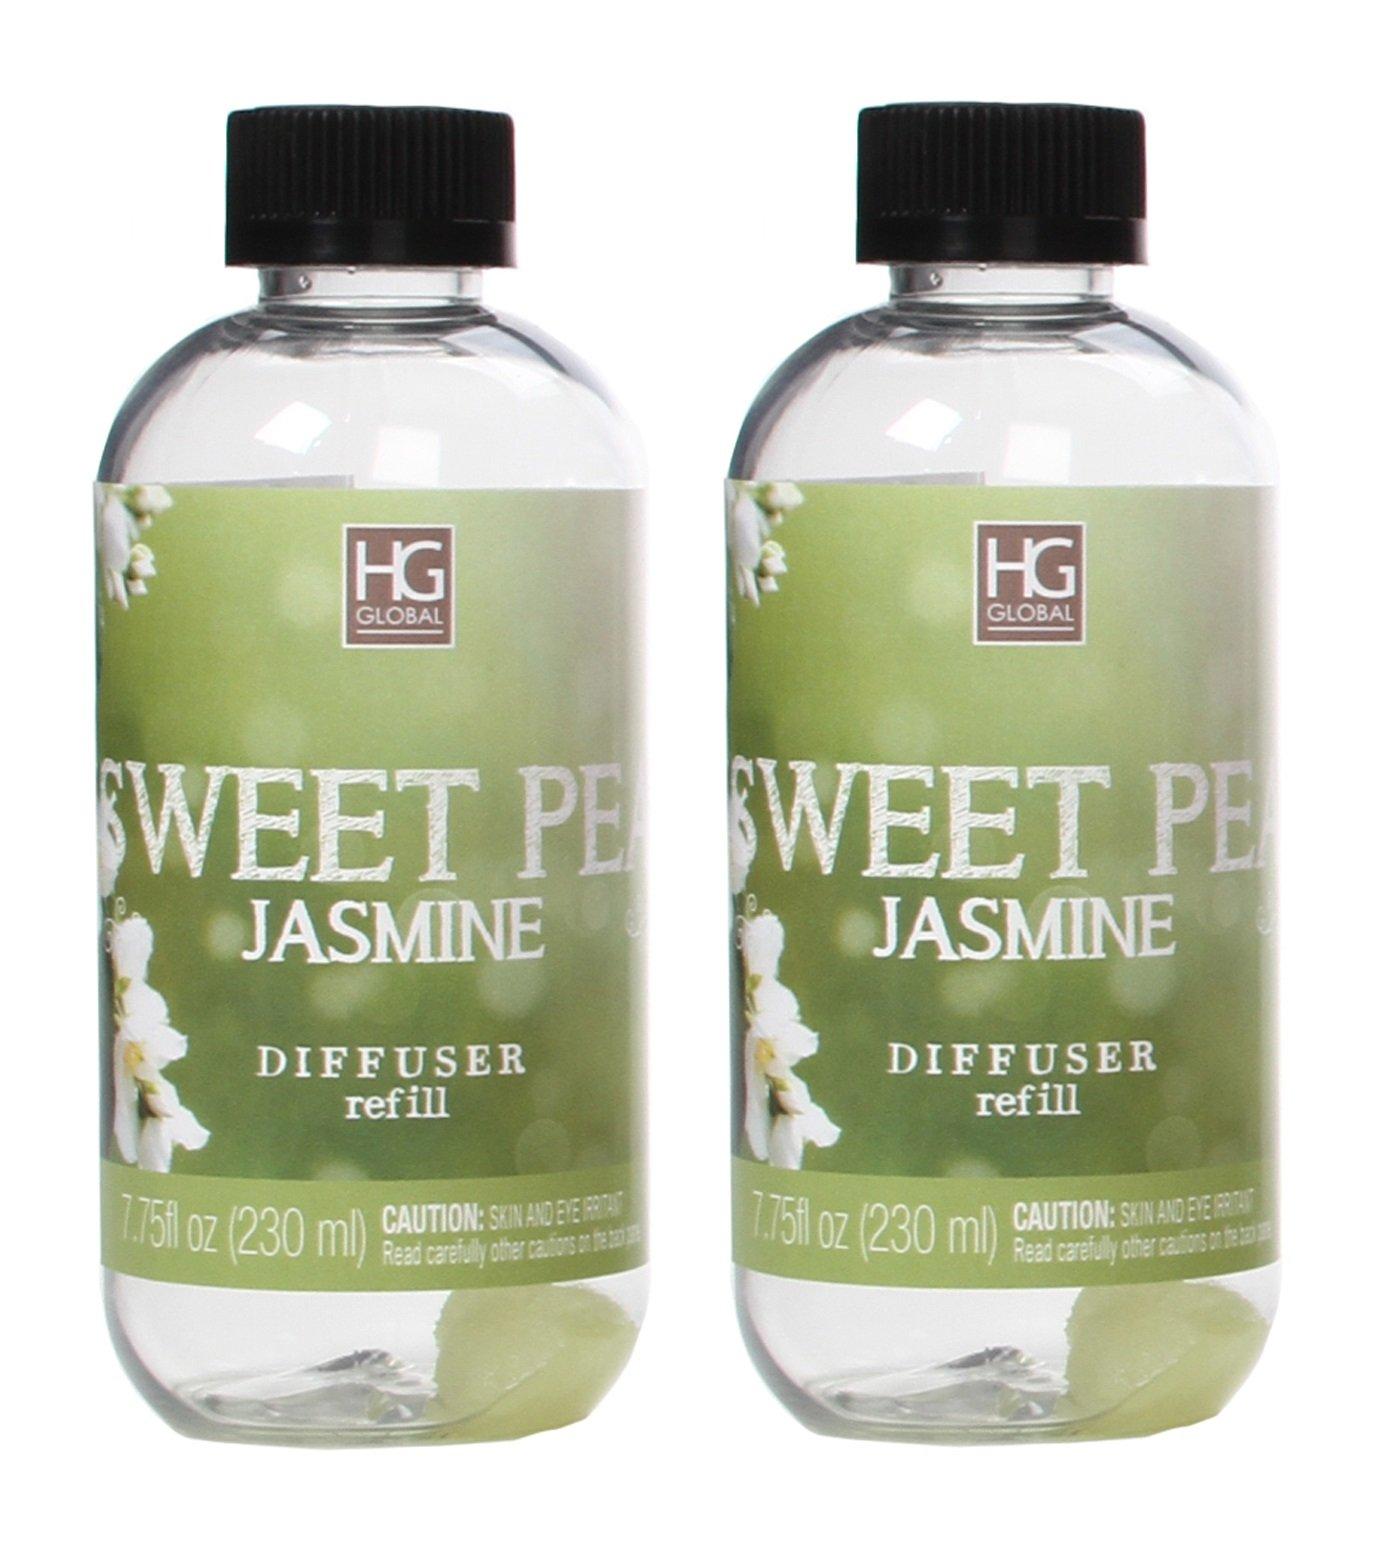 Hosley Set of 2 Premium Sweet Pea Jasmine Reed Diffuser Refills Oil, 230 ml (7.75 fl oz) Made in USA. BULK BUY. Ideal GIFT for weddings, spa, Reiki, Meditation settings W1 by Hosley